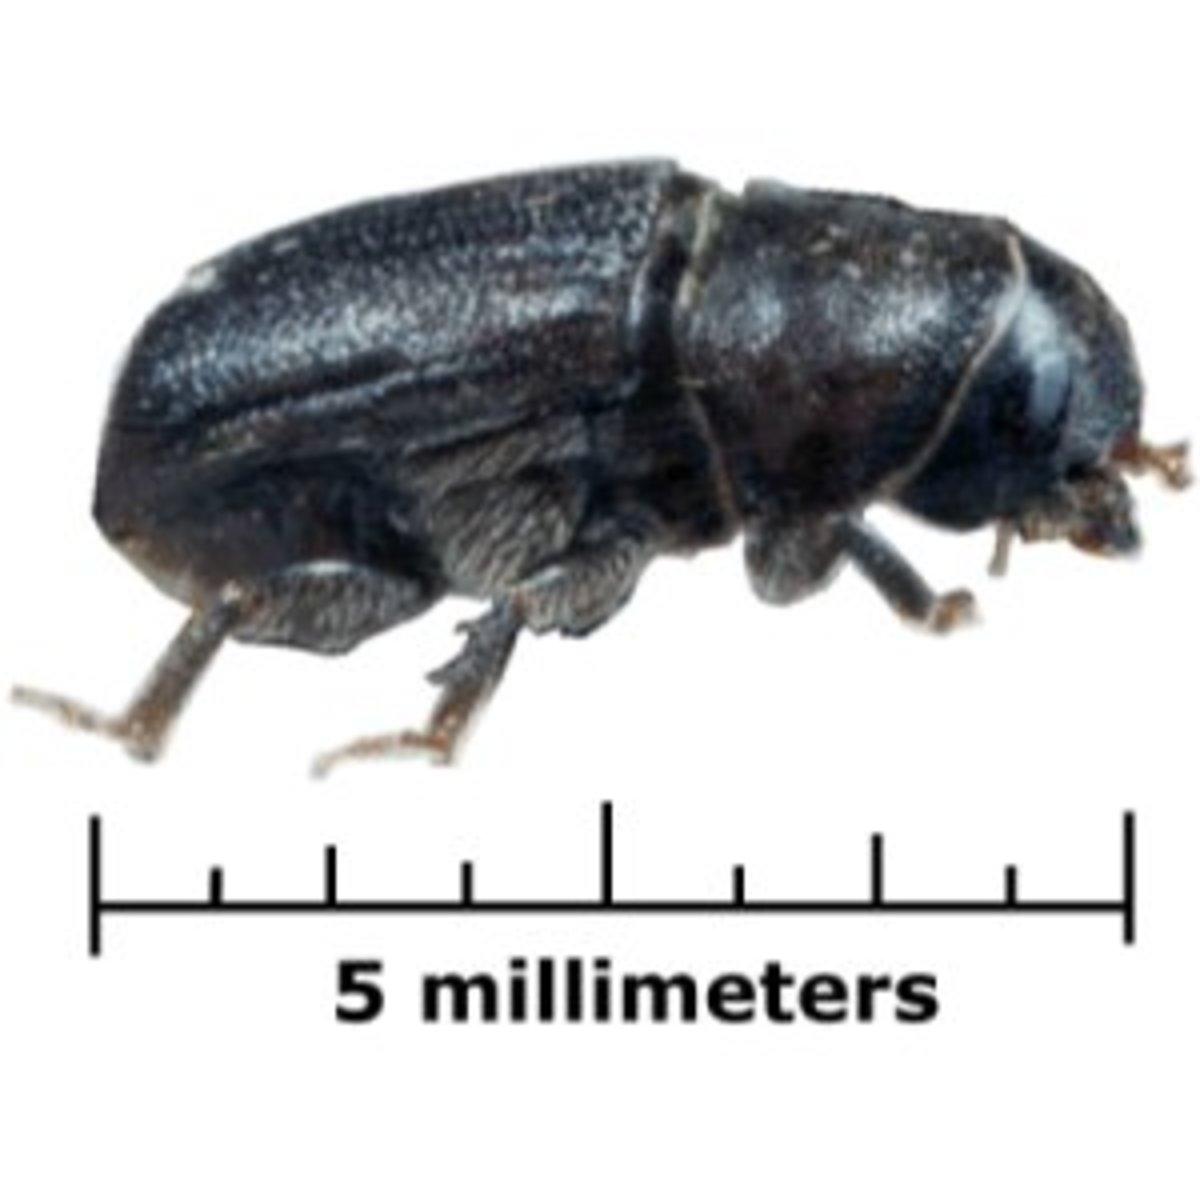 Mountain Pine Beetle (Dendroctonus ponderosae)